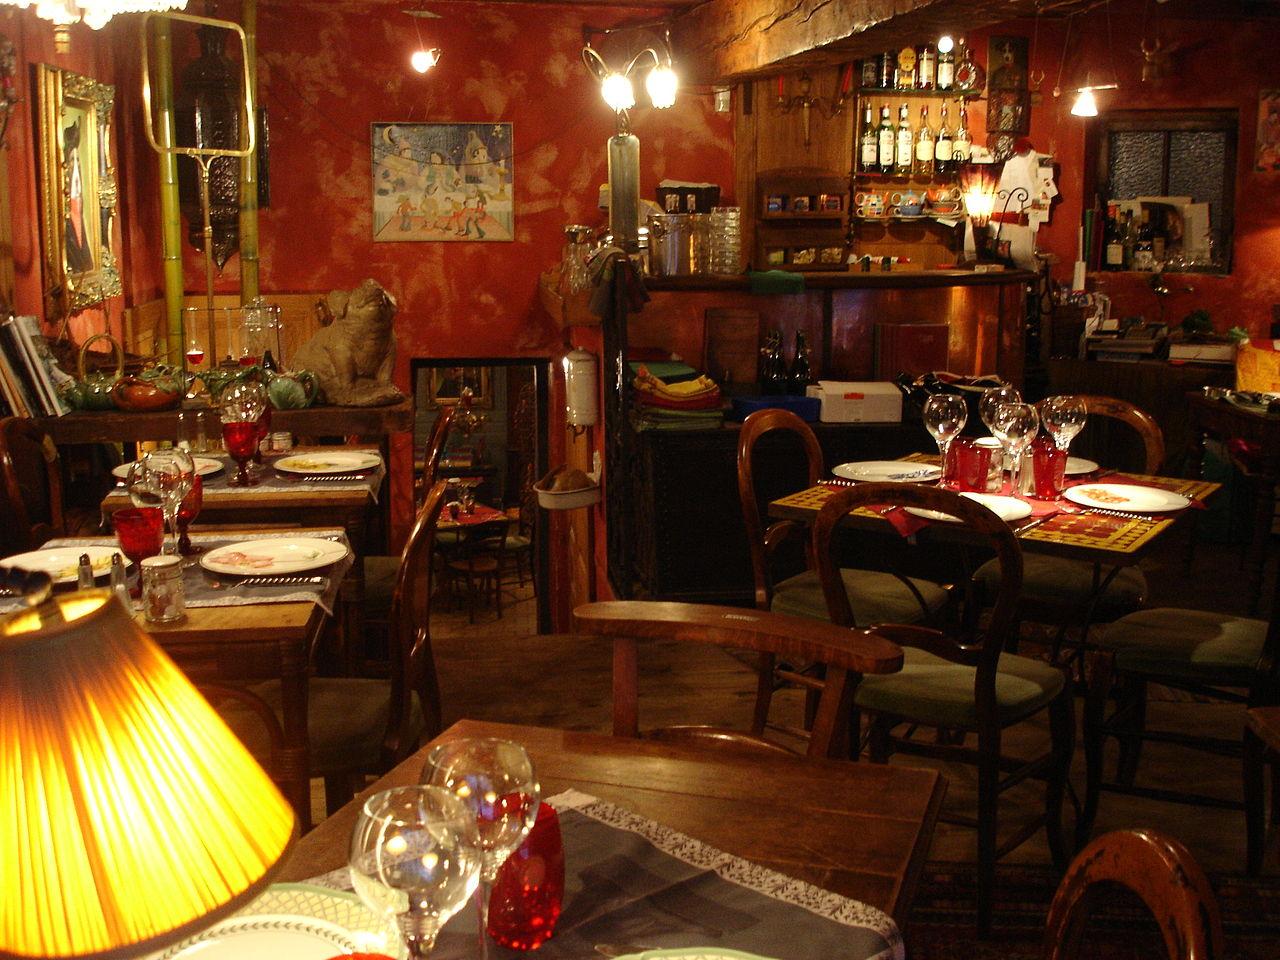 Restaurant Le Tire Chon Strasbourg Bou